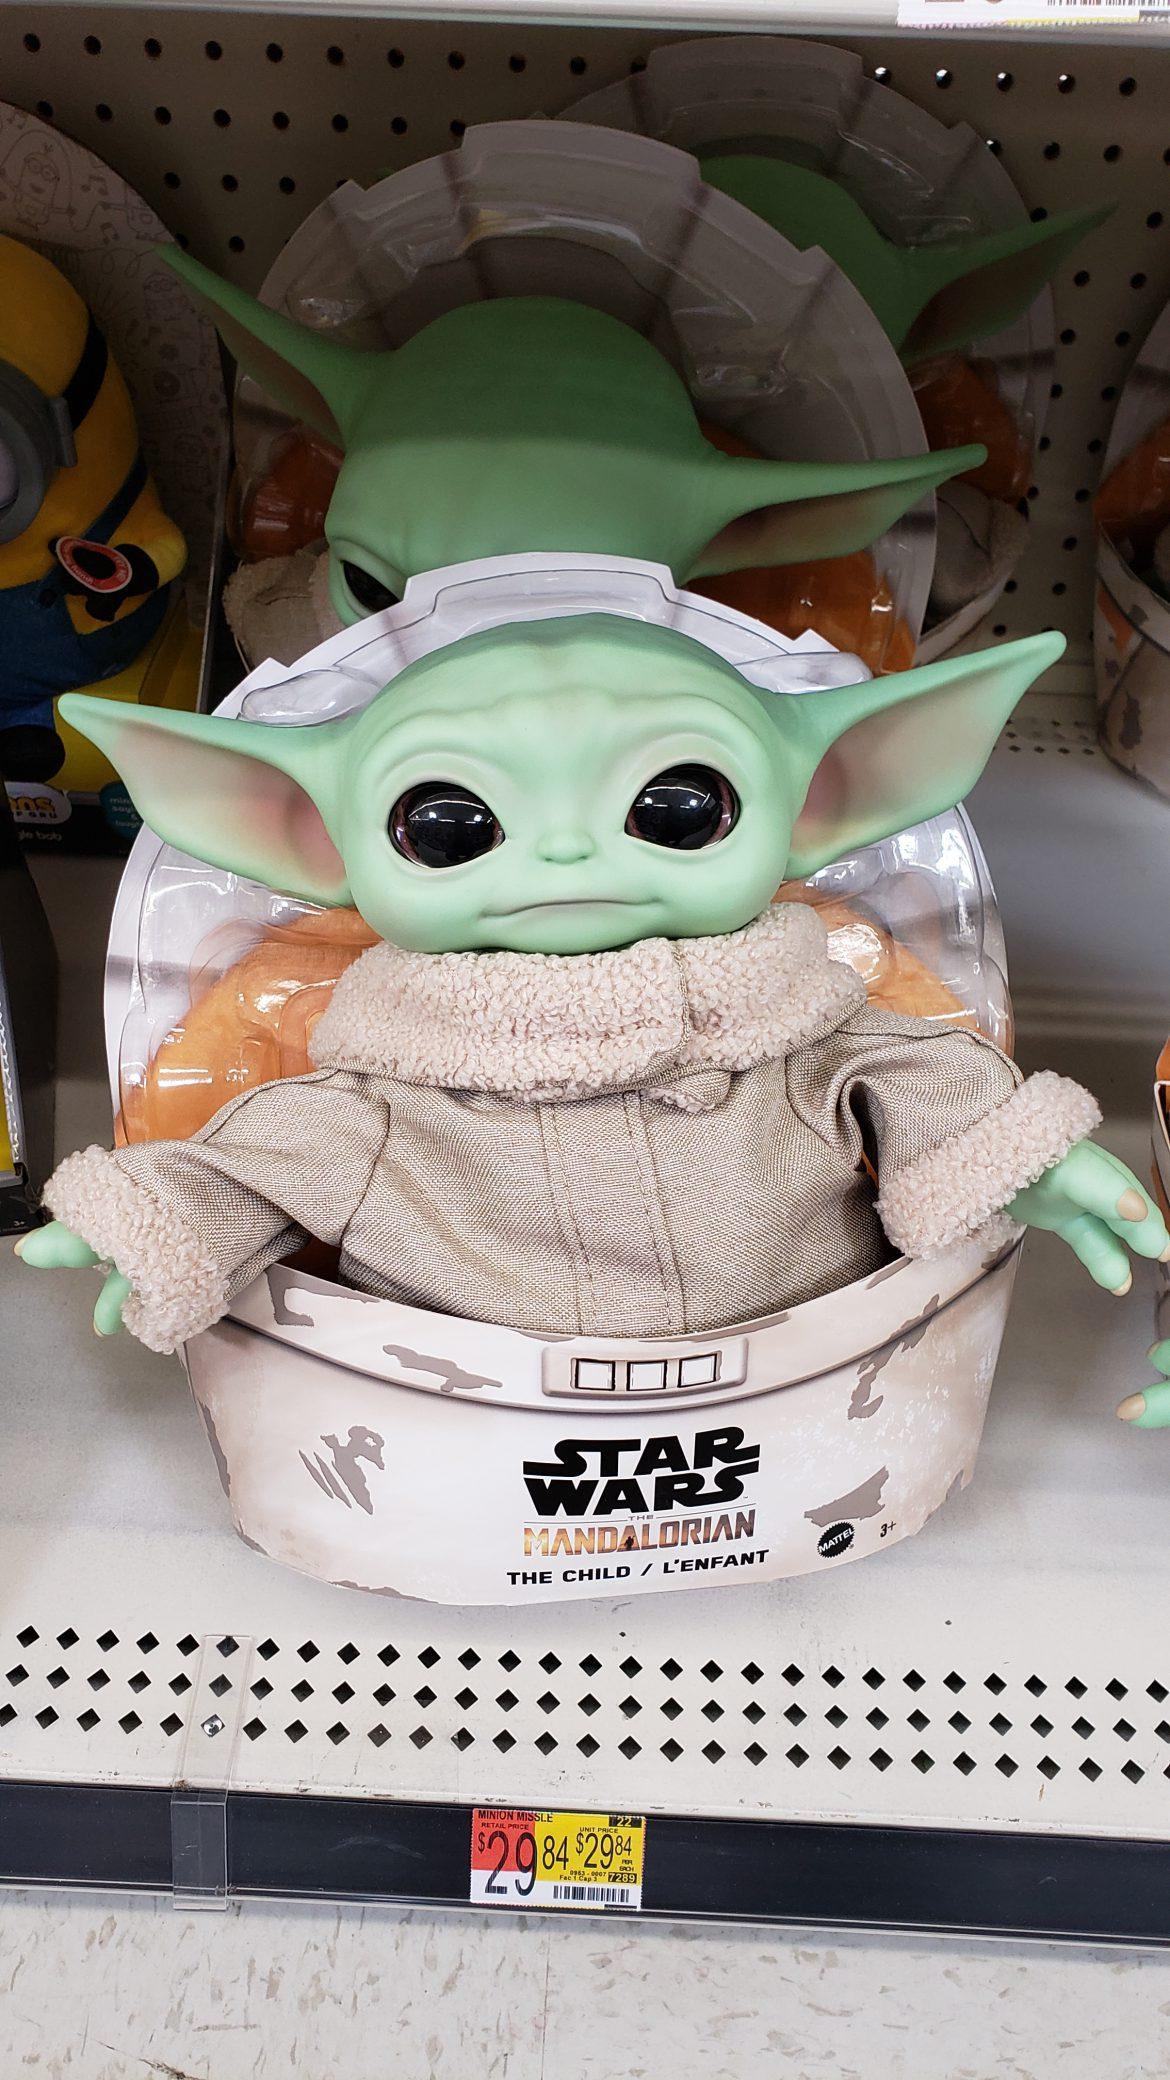 Star Wars Mandalorian the Child plush spotted at Walmart